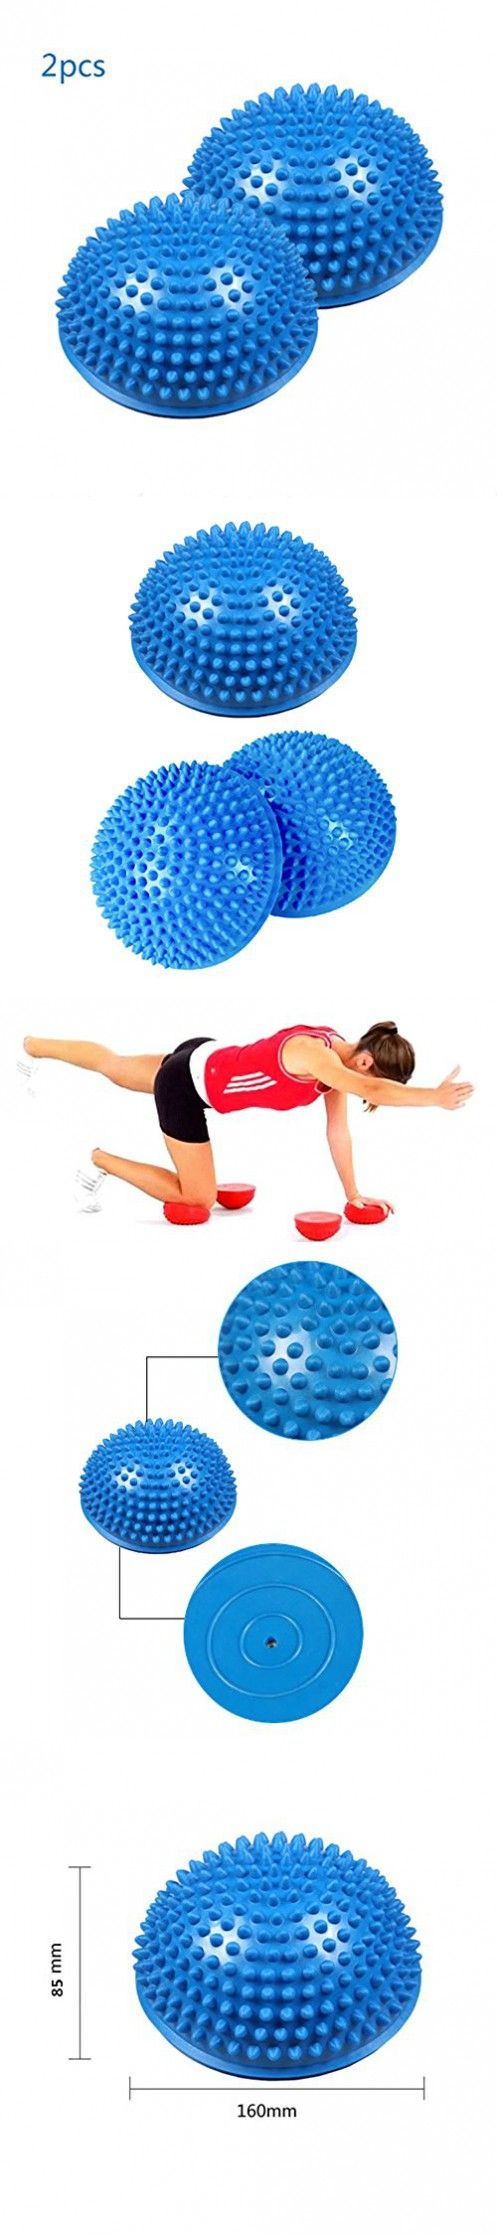 2Pcs Blue Anti-slip Foot Massage Ball Yoga Half Ball, 16cm/6.5inch Massage Mat Exercise Balance Pods Spiky Point for Gym Fitness Pilates